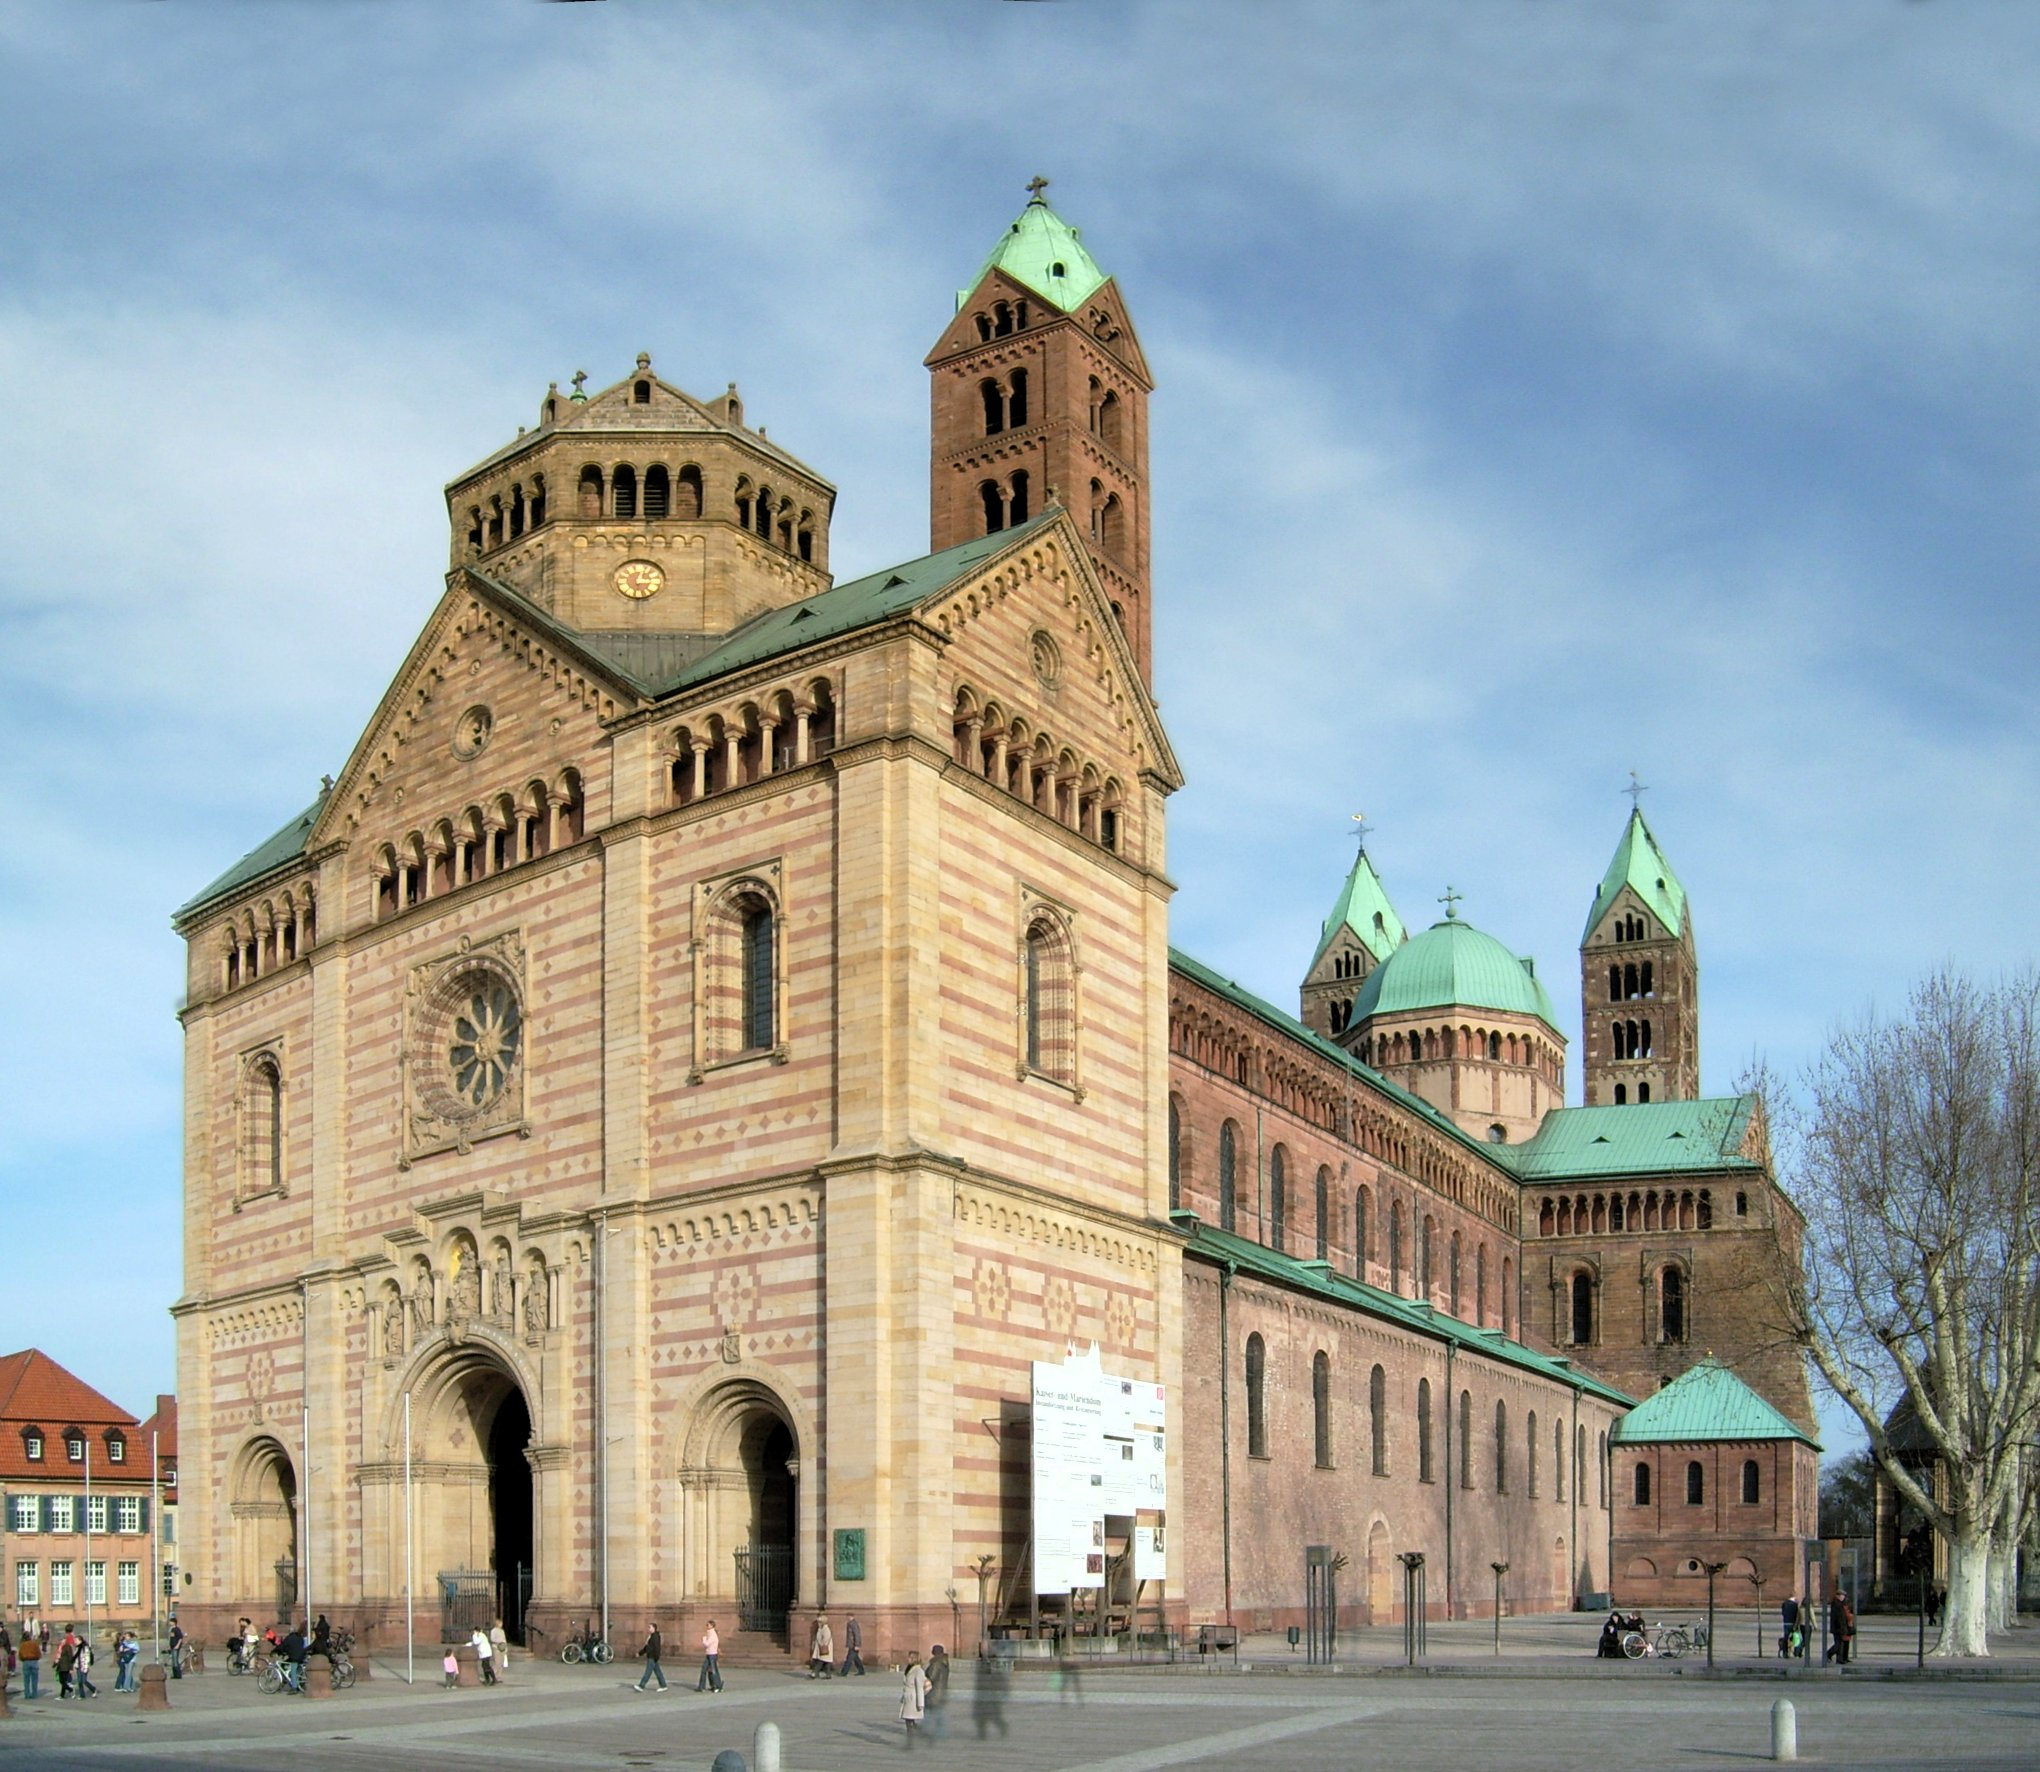 Kirche (Bauwerk) - Wikiwand